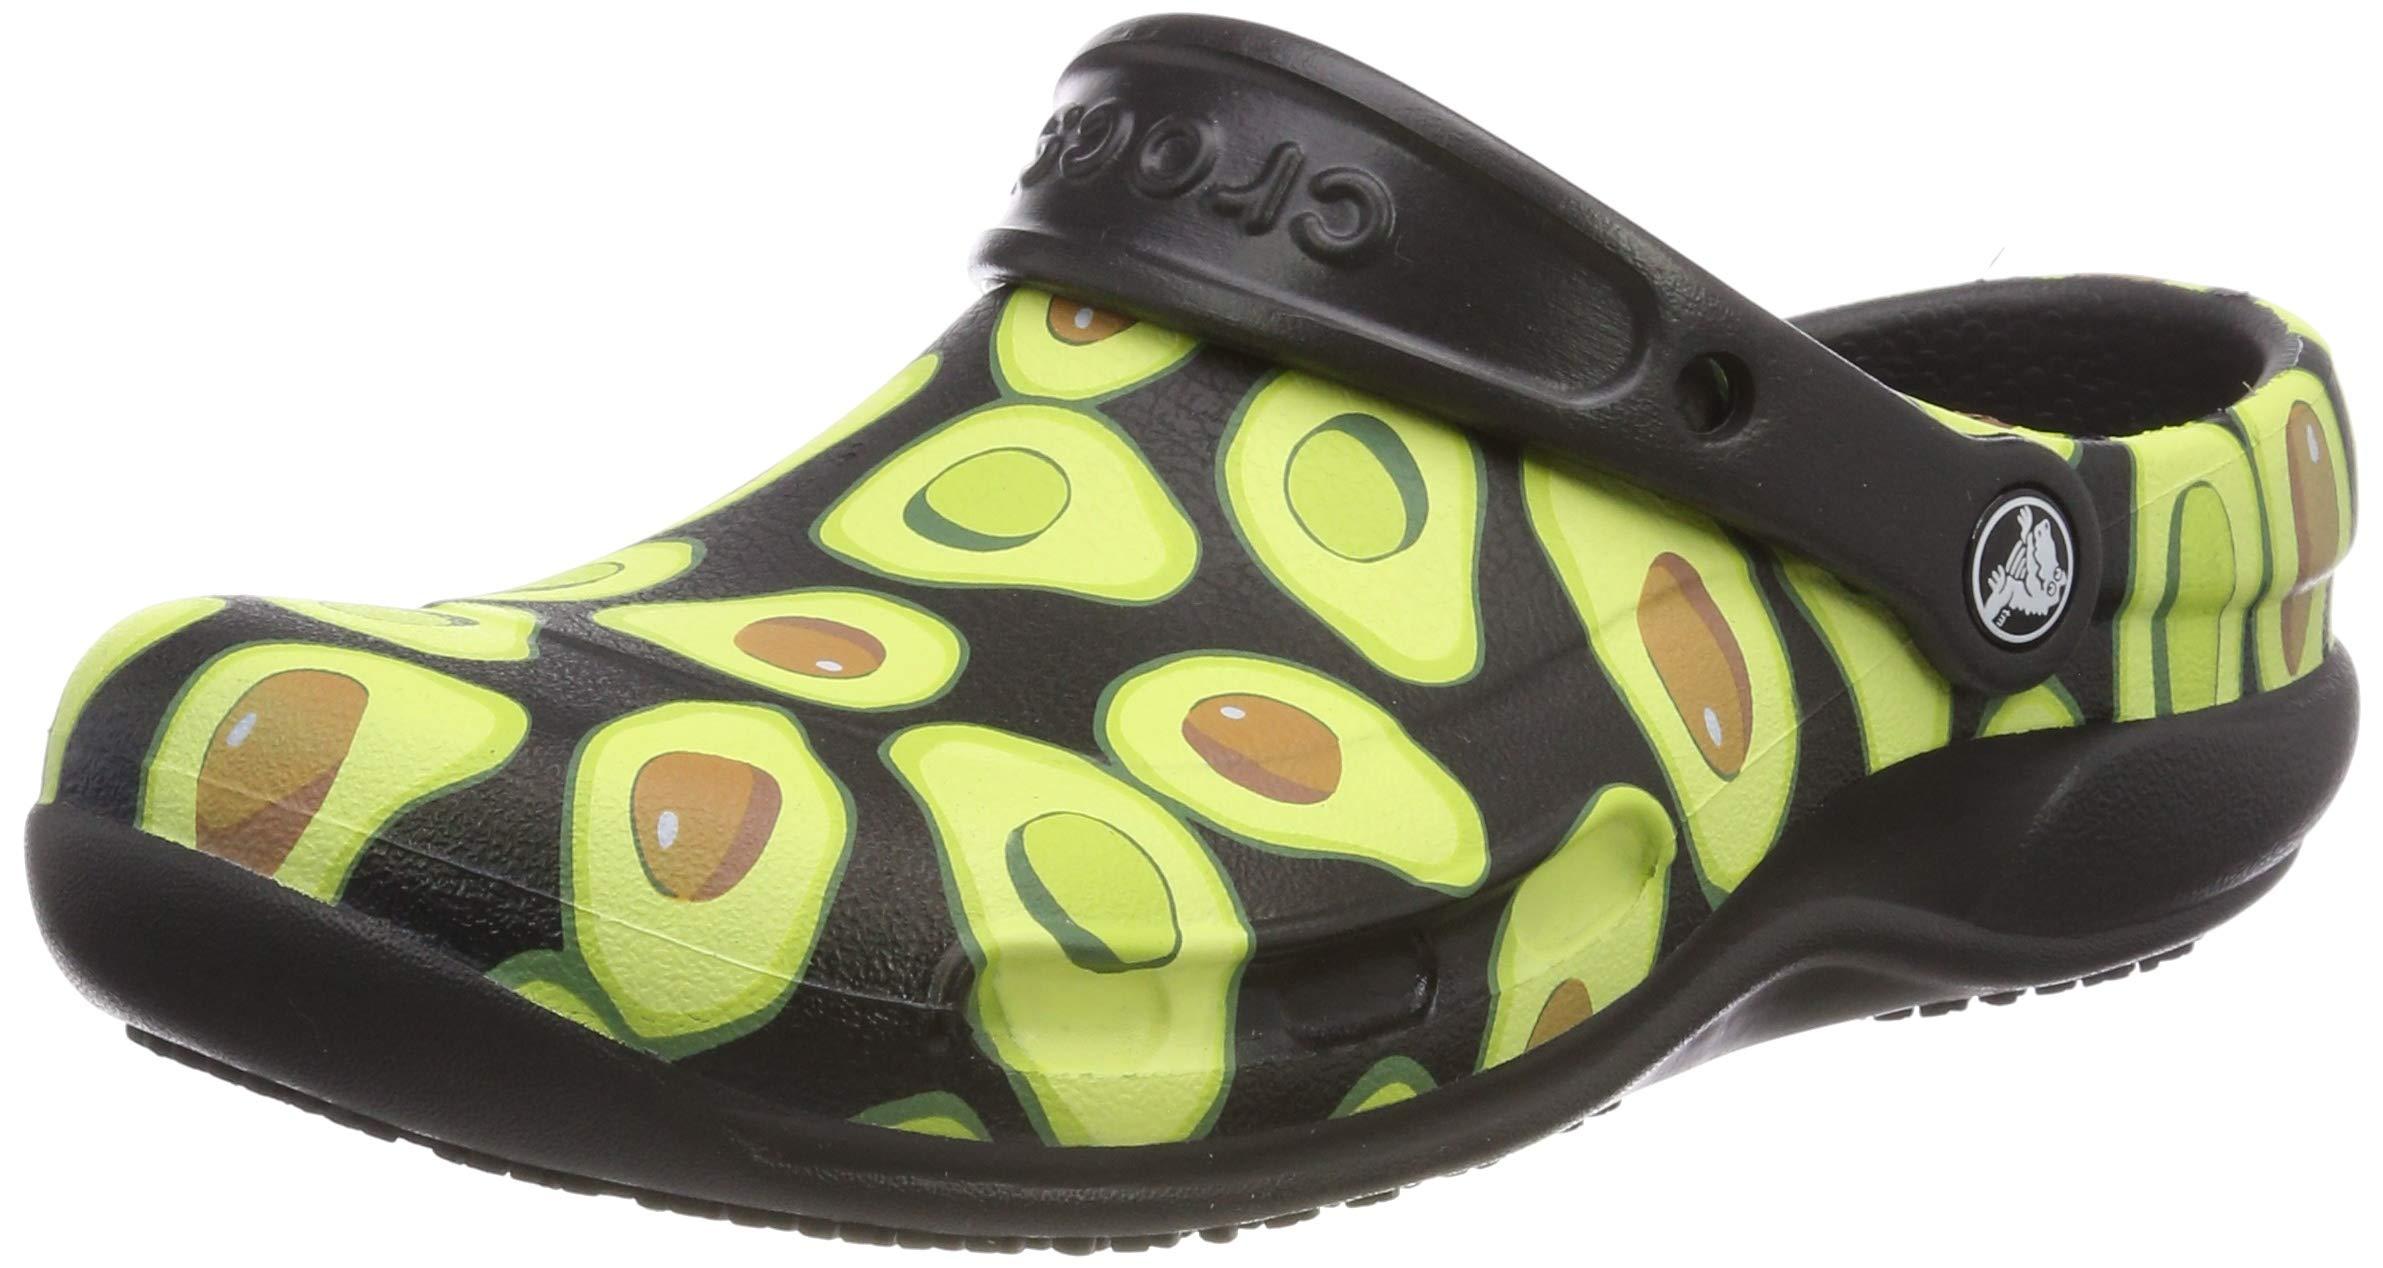 Crocs Men's and Women's Bistro Graphic Clog | Slip Resistant Work Shoe | Great Nursing or Chef Shoe